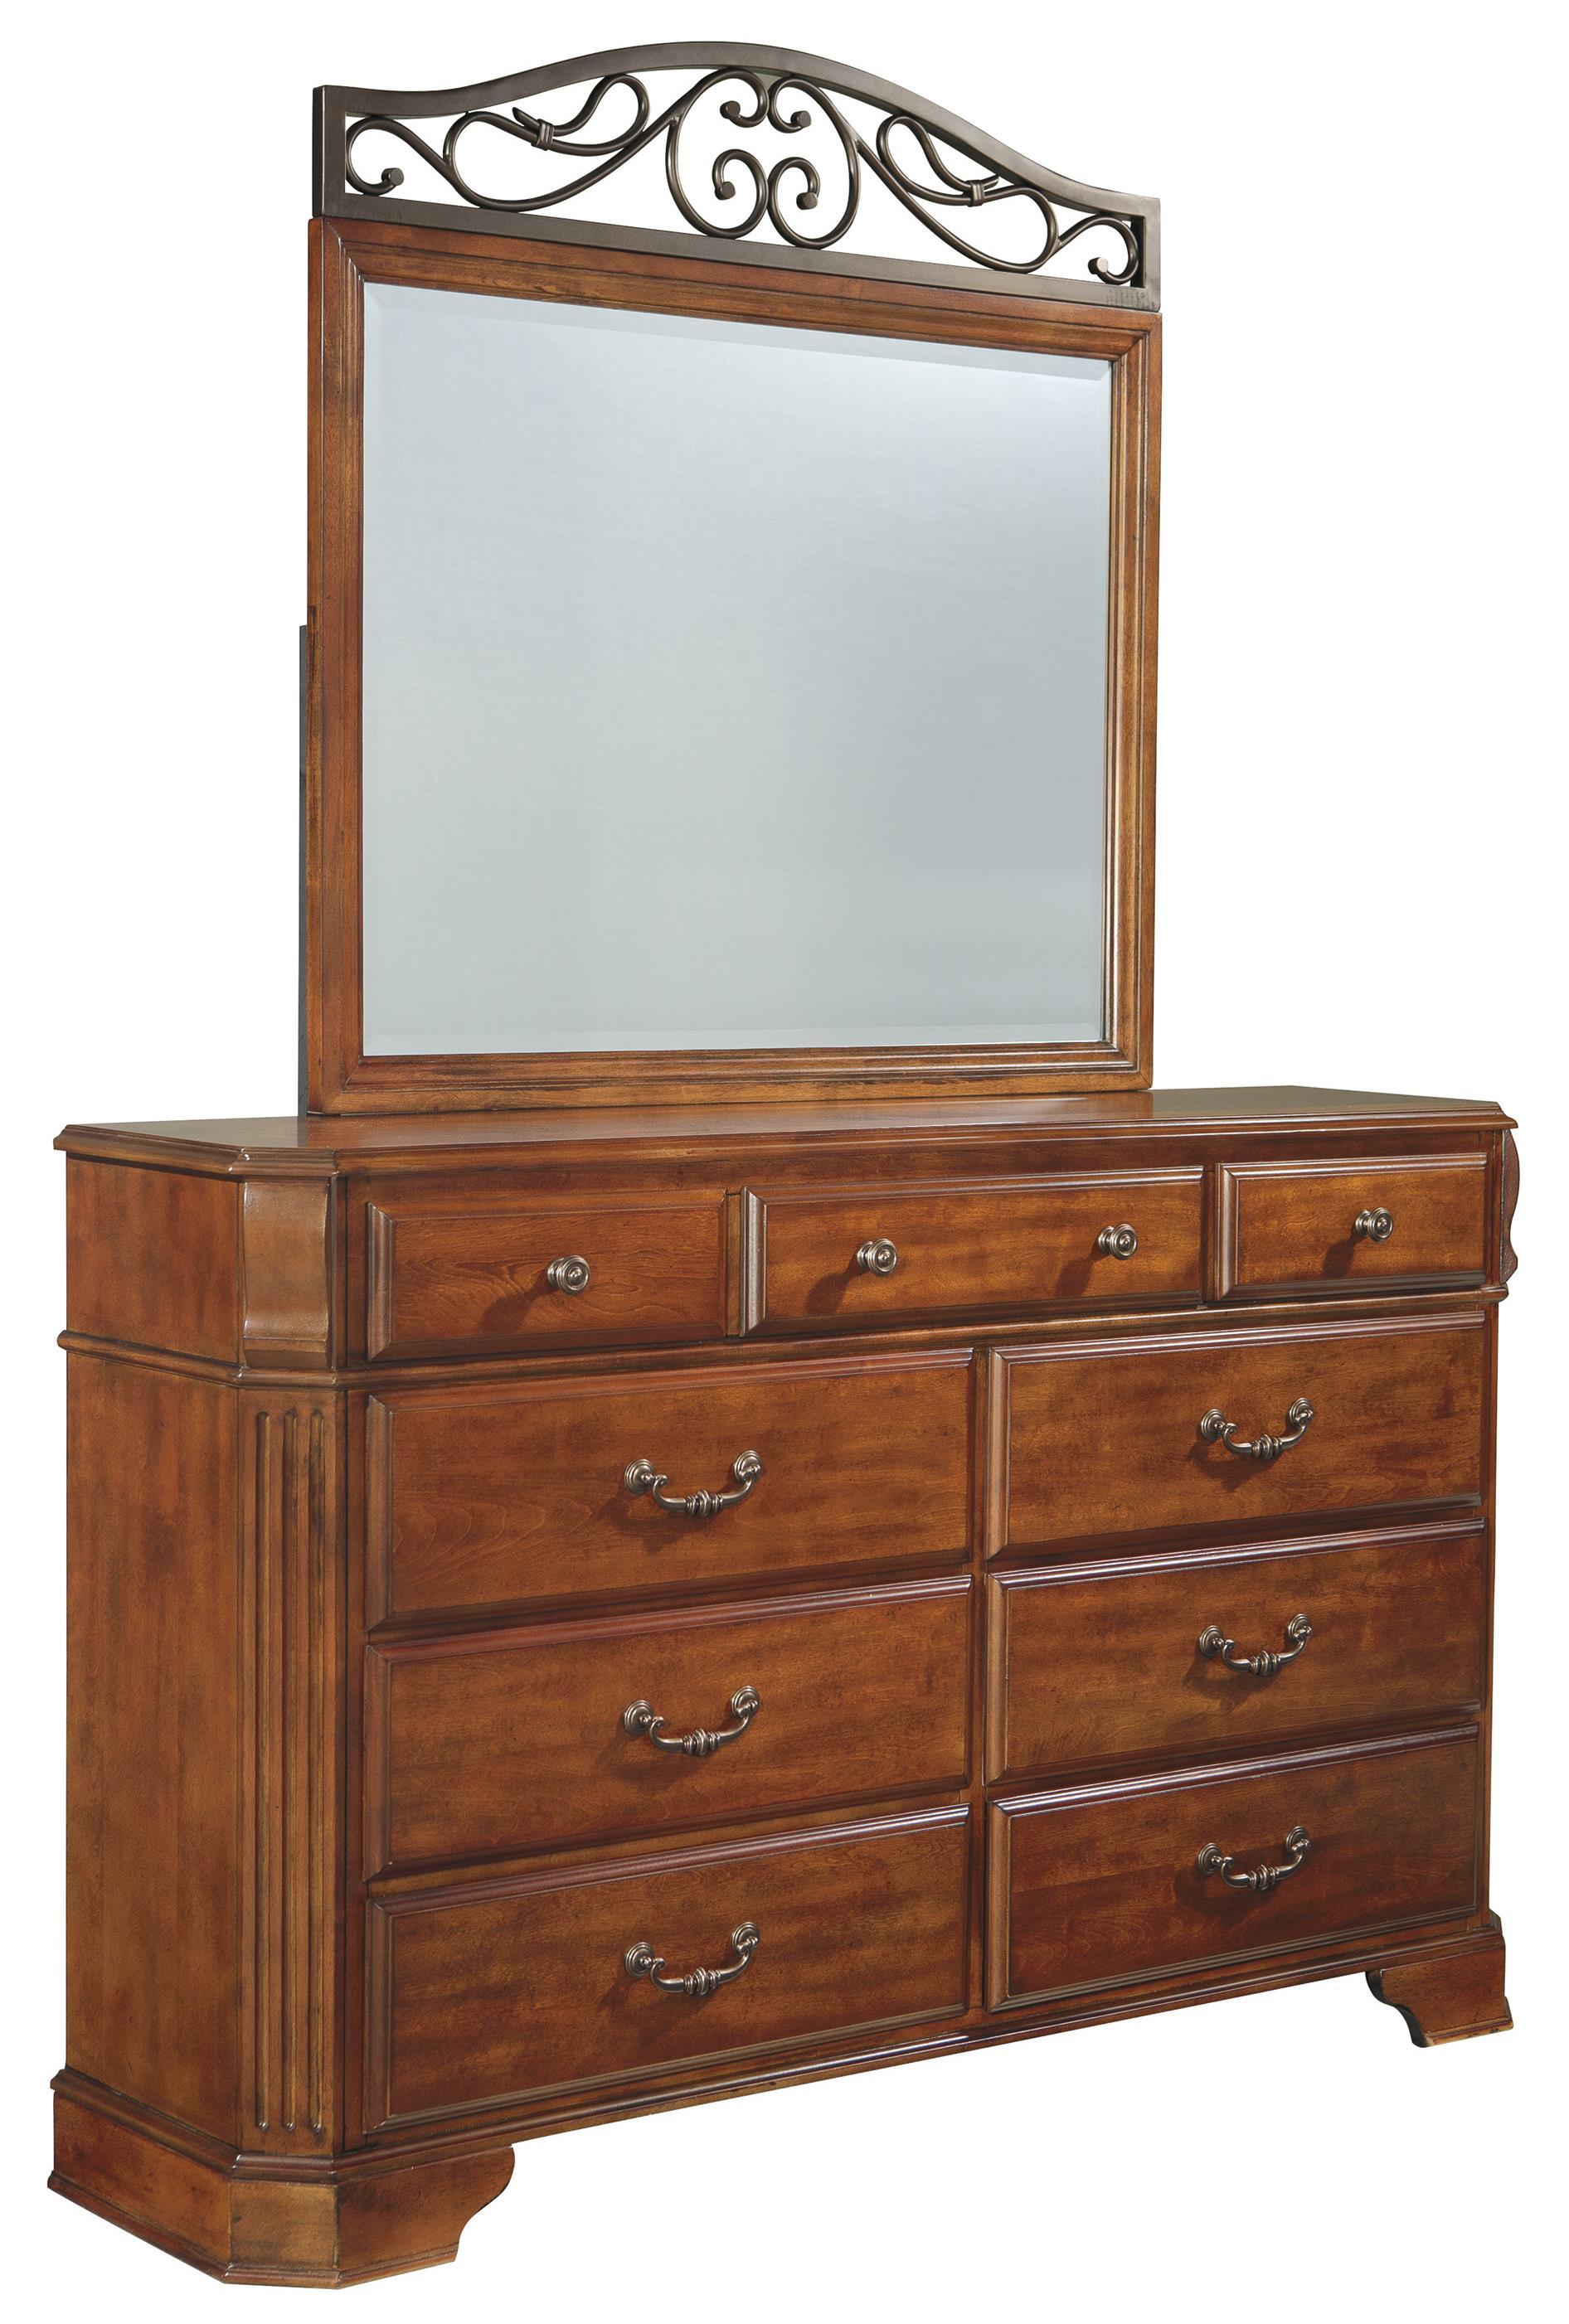 Signature Design by Ashley Wyatt 9 Drawer Dresser & Mirror - Item Number: B429-31+36